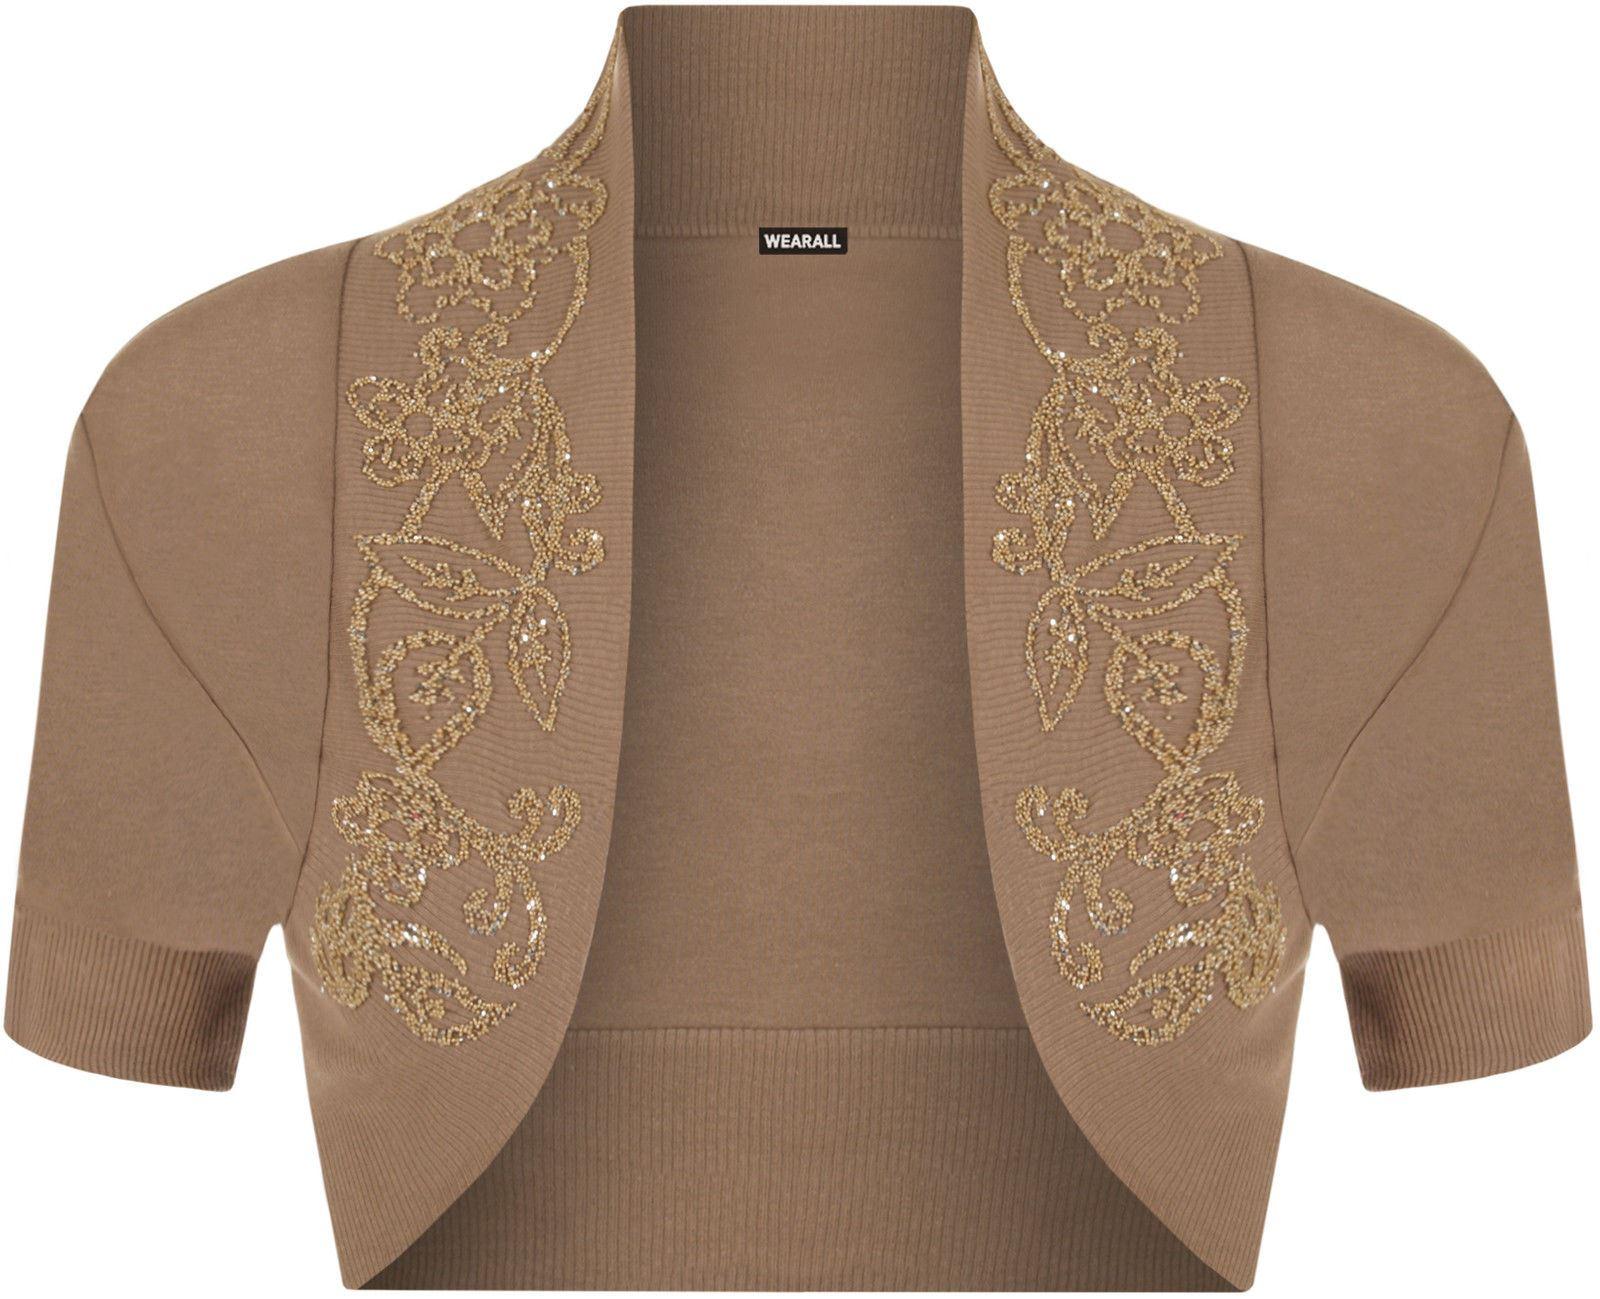 Womens Cap Sleeves Stretchy Bolero Cropped Ladies Open Beaded Sequin Shrug Top